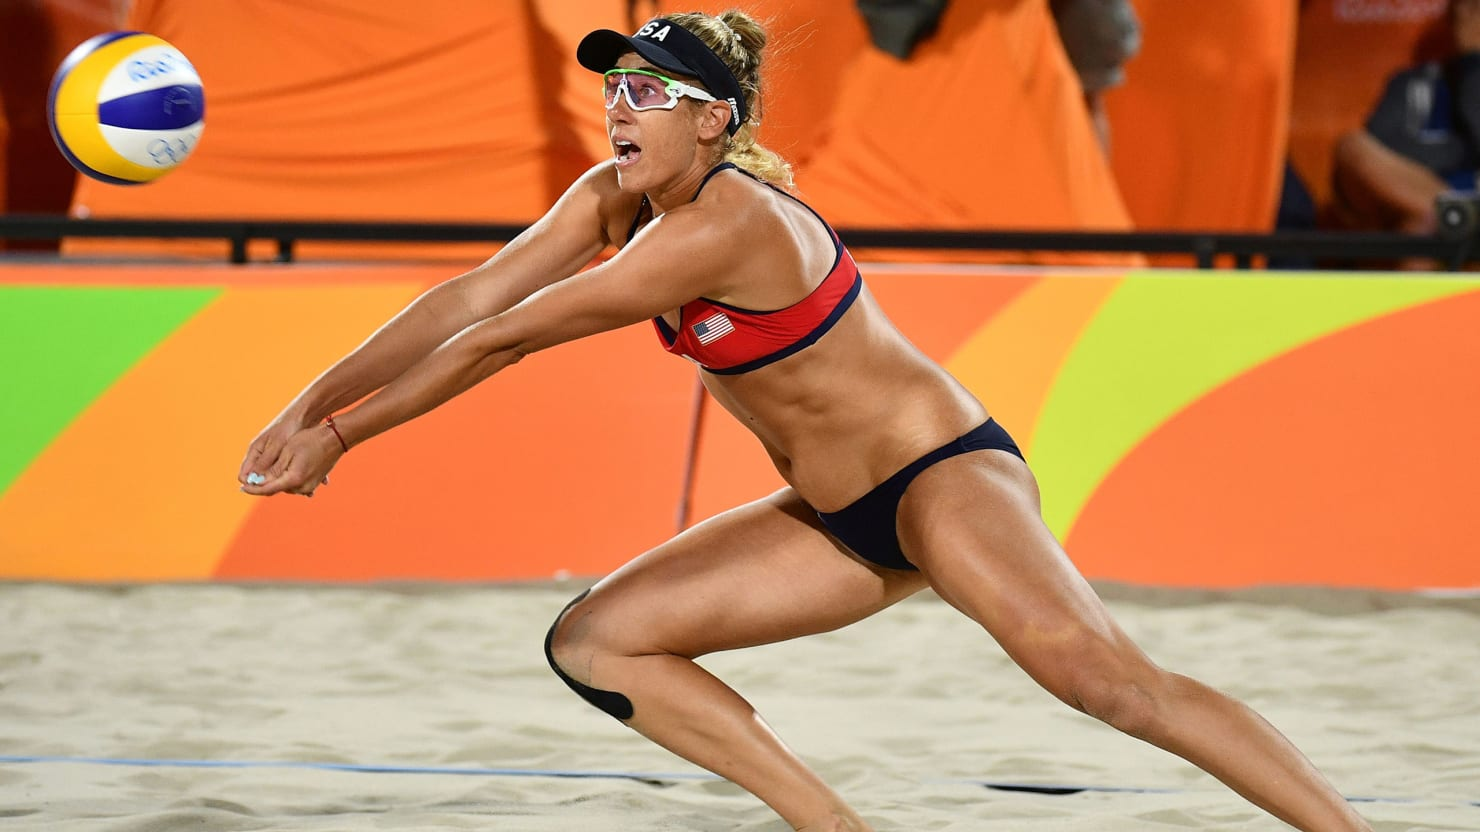 Spiele Volley Beauties - Video Slots Online